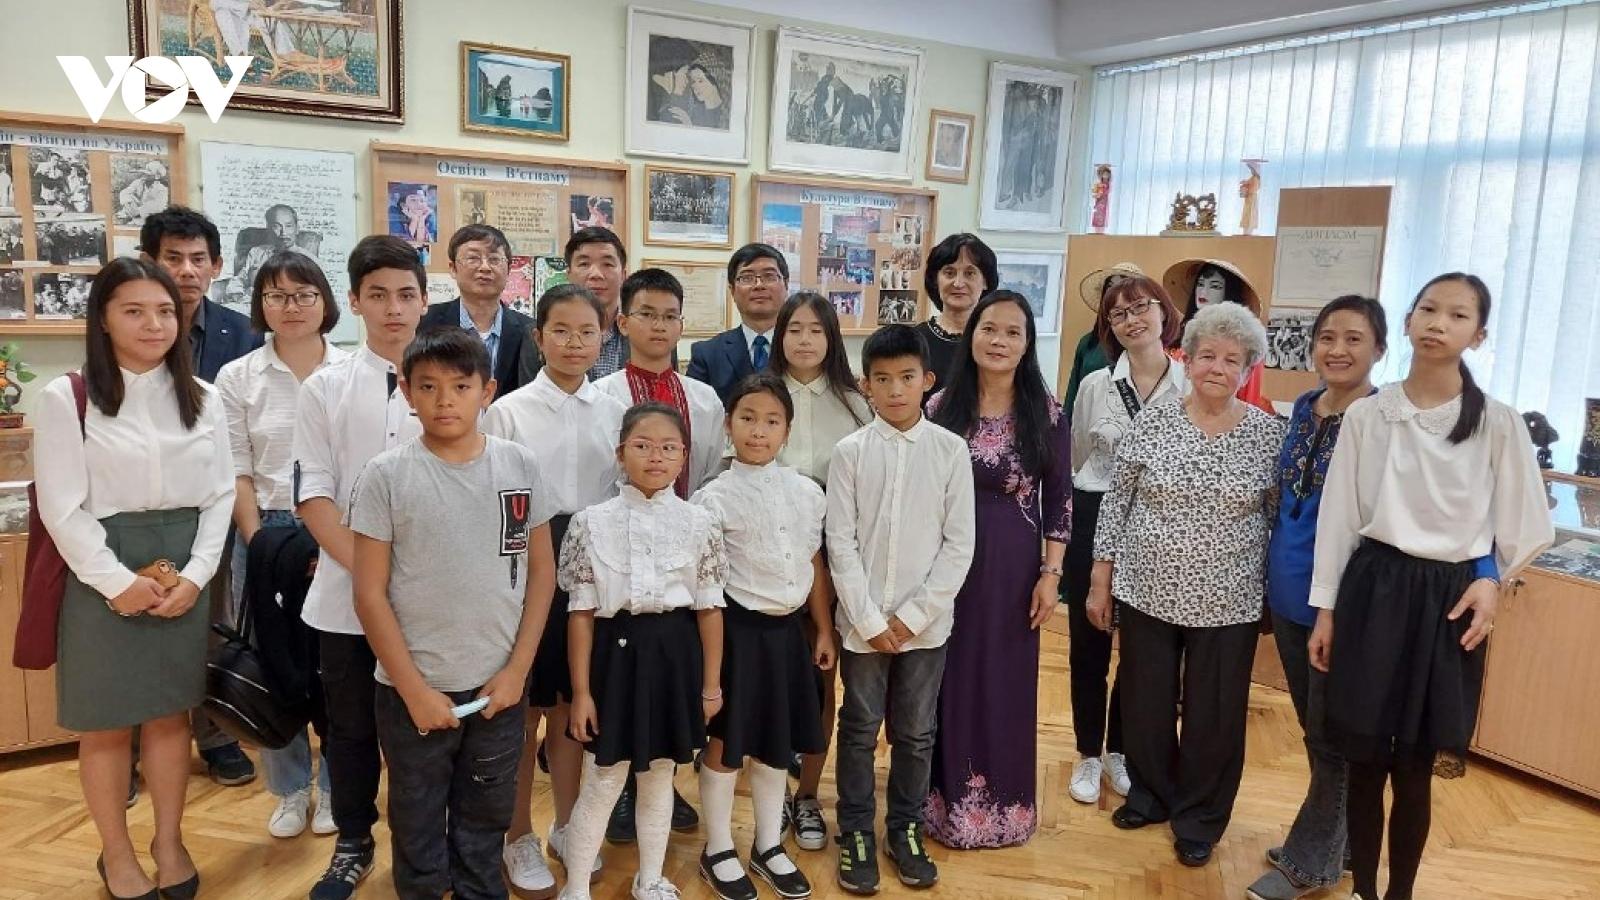 Khai giảng lớp tiếng Việt tại Ukraine